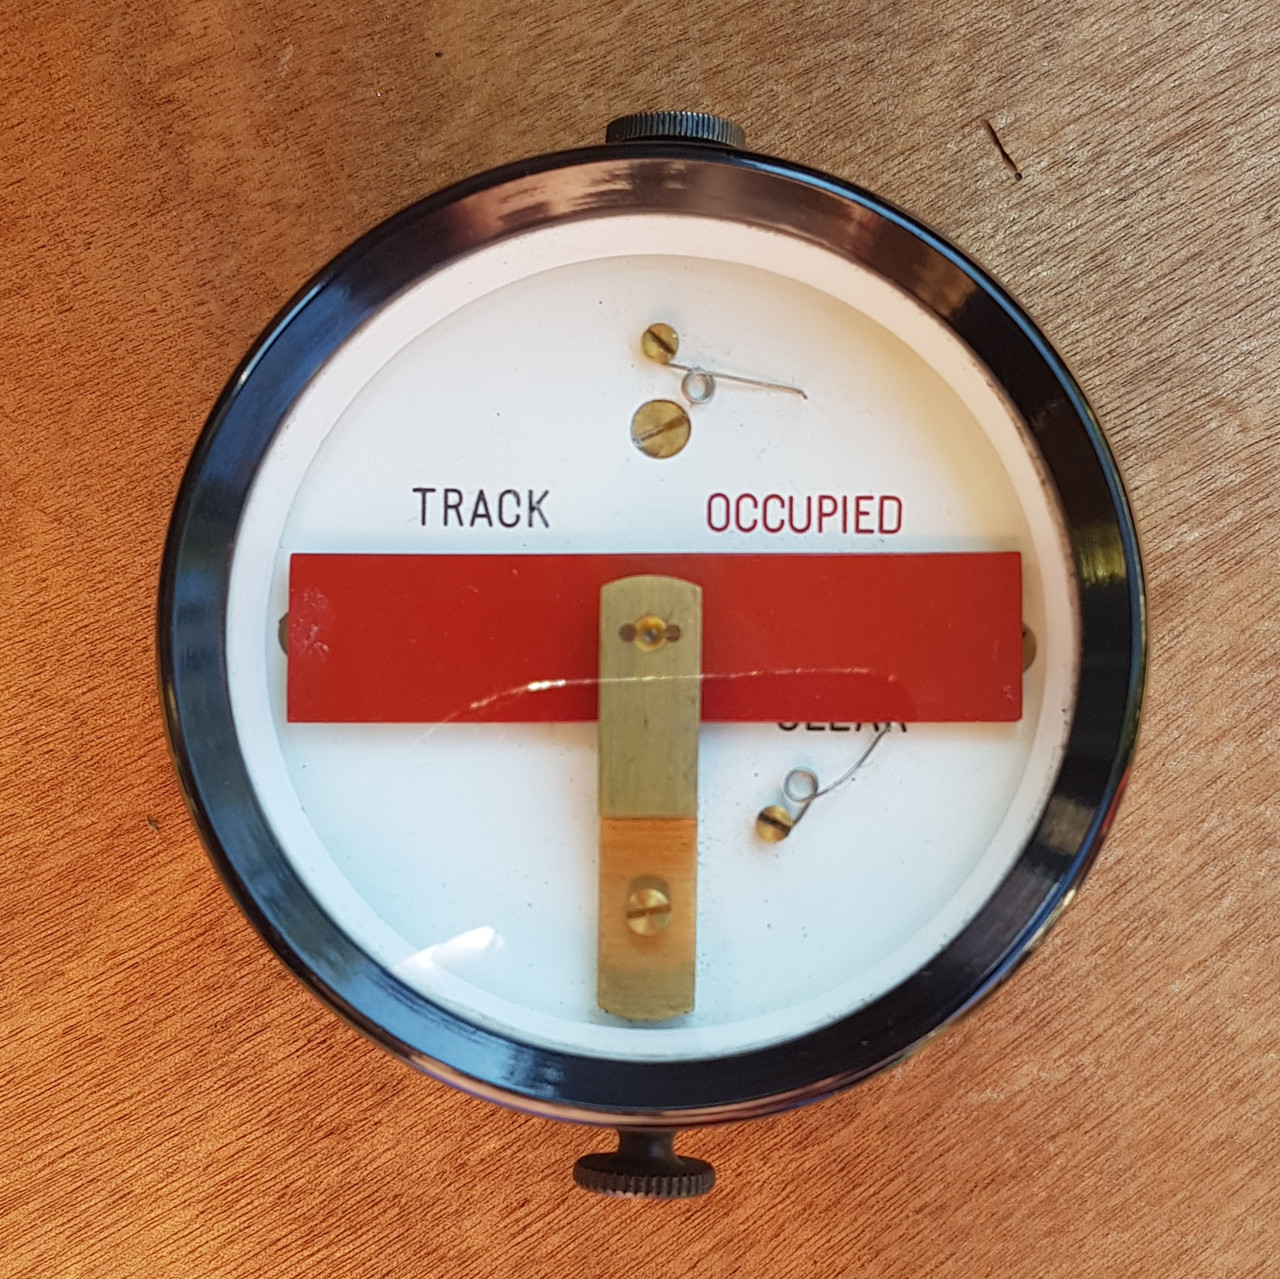 VT 4113. BR WR  BAKELITE TRACK CIRCUIT INDICATOR BY R.E.THOMPSON.